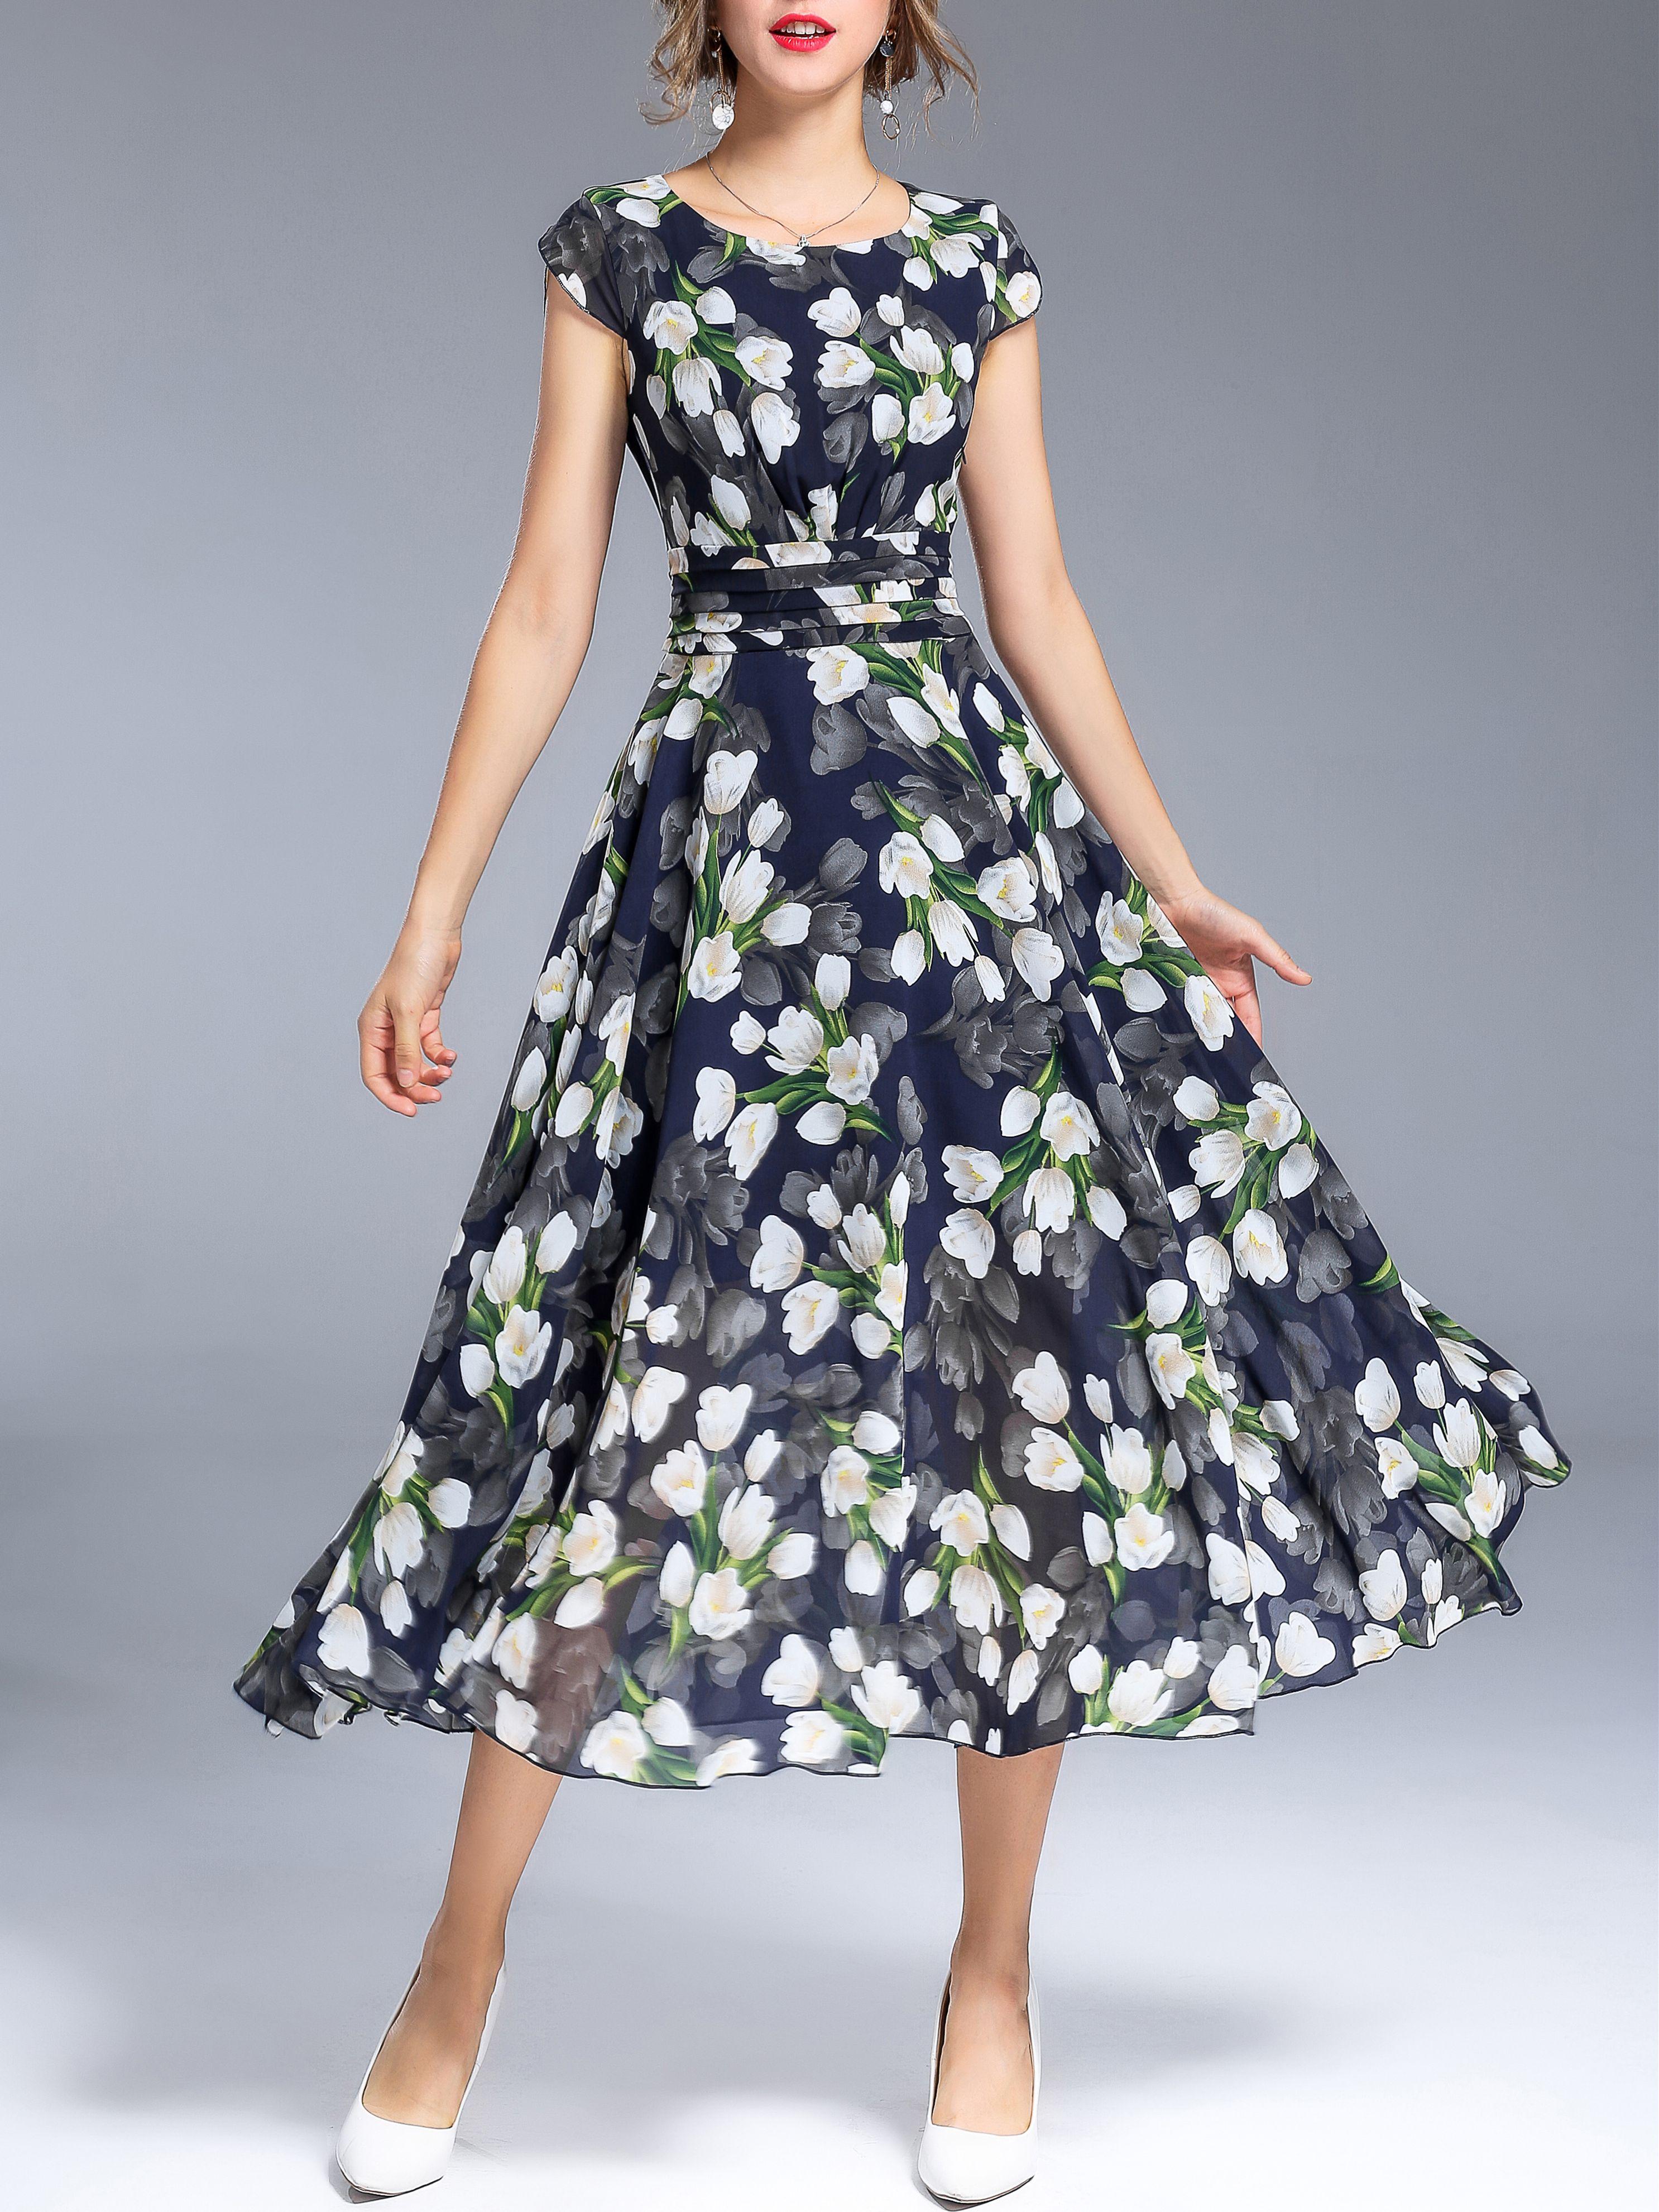 85054edf38a6 Cute Dresses, Vintage Dresses, Casual Dresses, Beautiful Dresses,